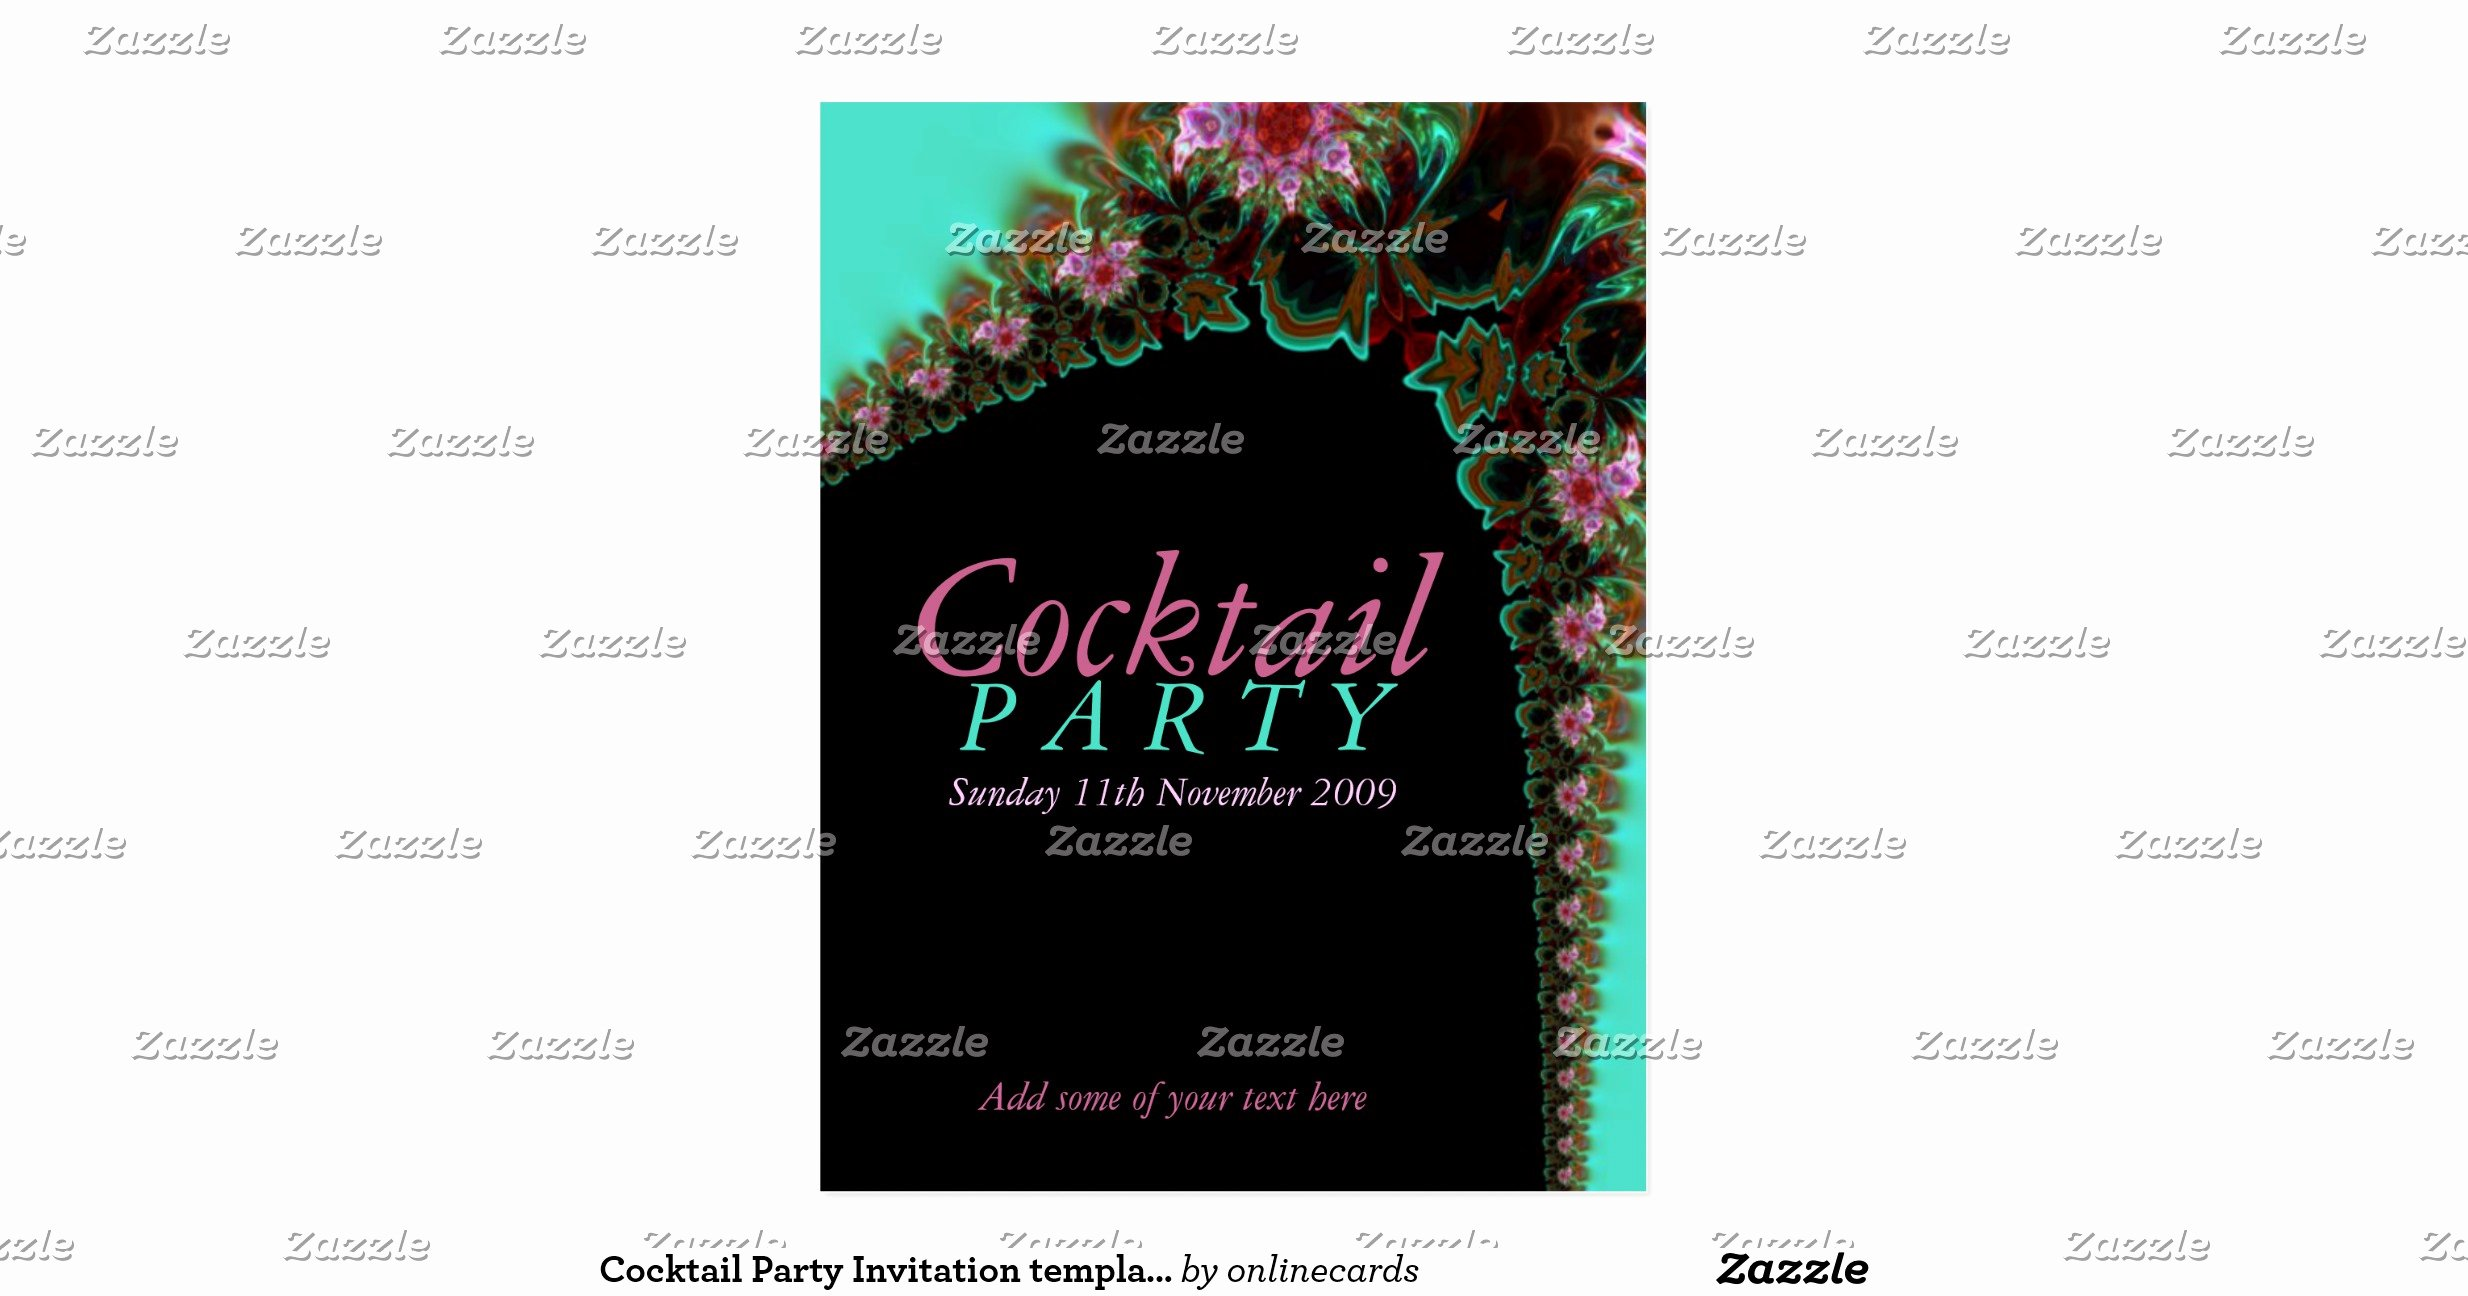 Cocktail Party Invitation Template Unique Cocktail Party Invitation Template Postcard